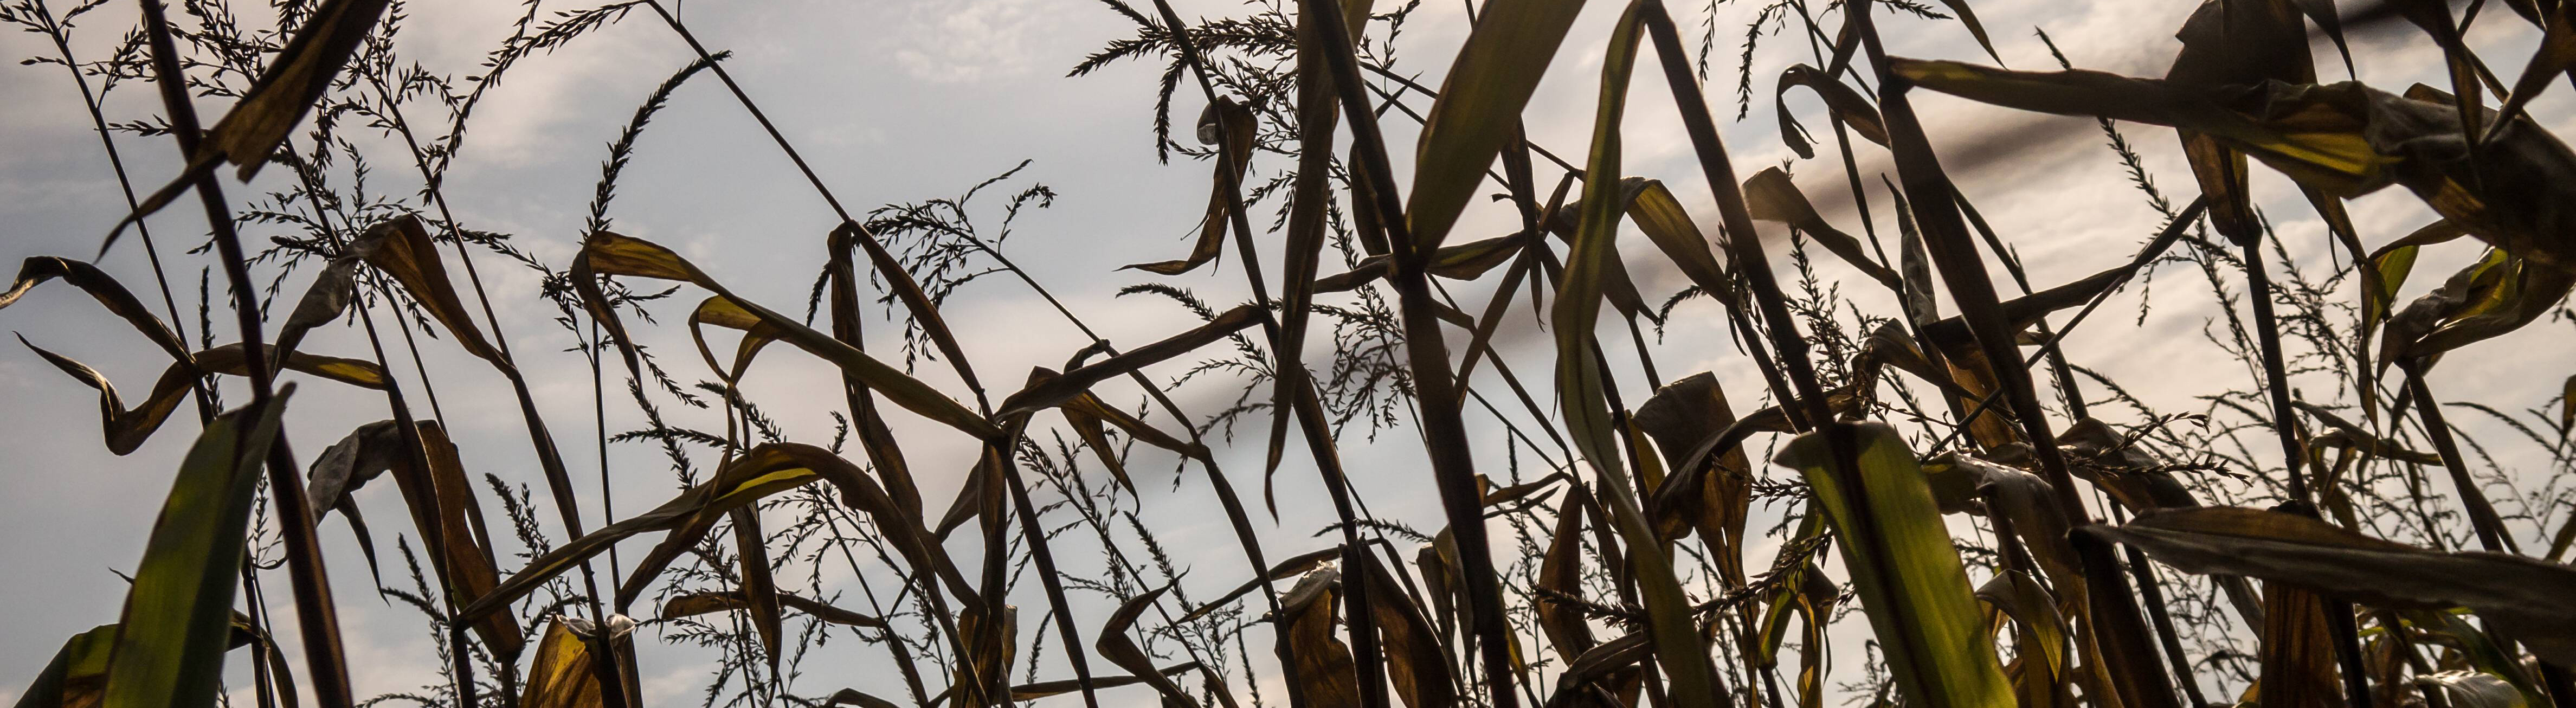 Vertrockneter Mais